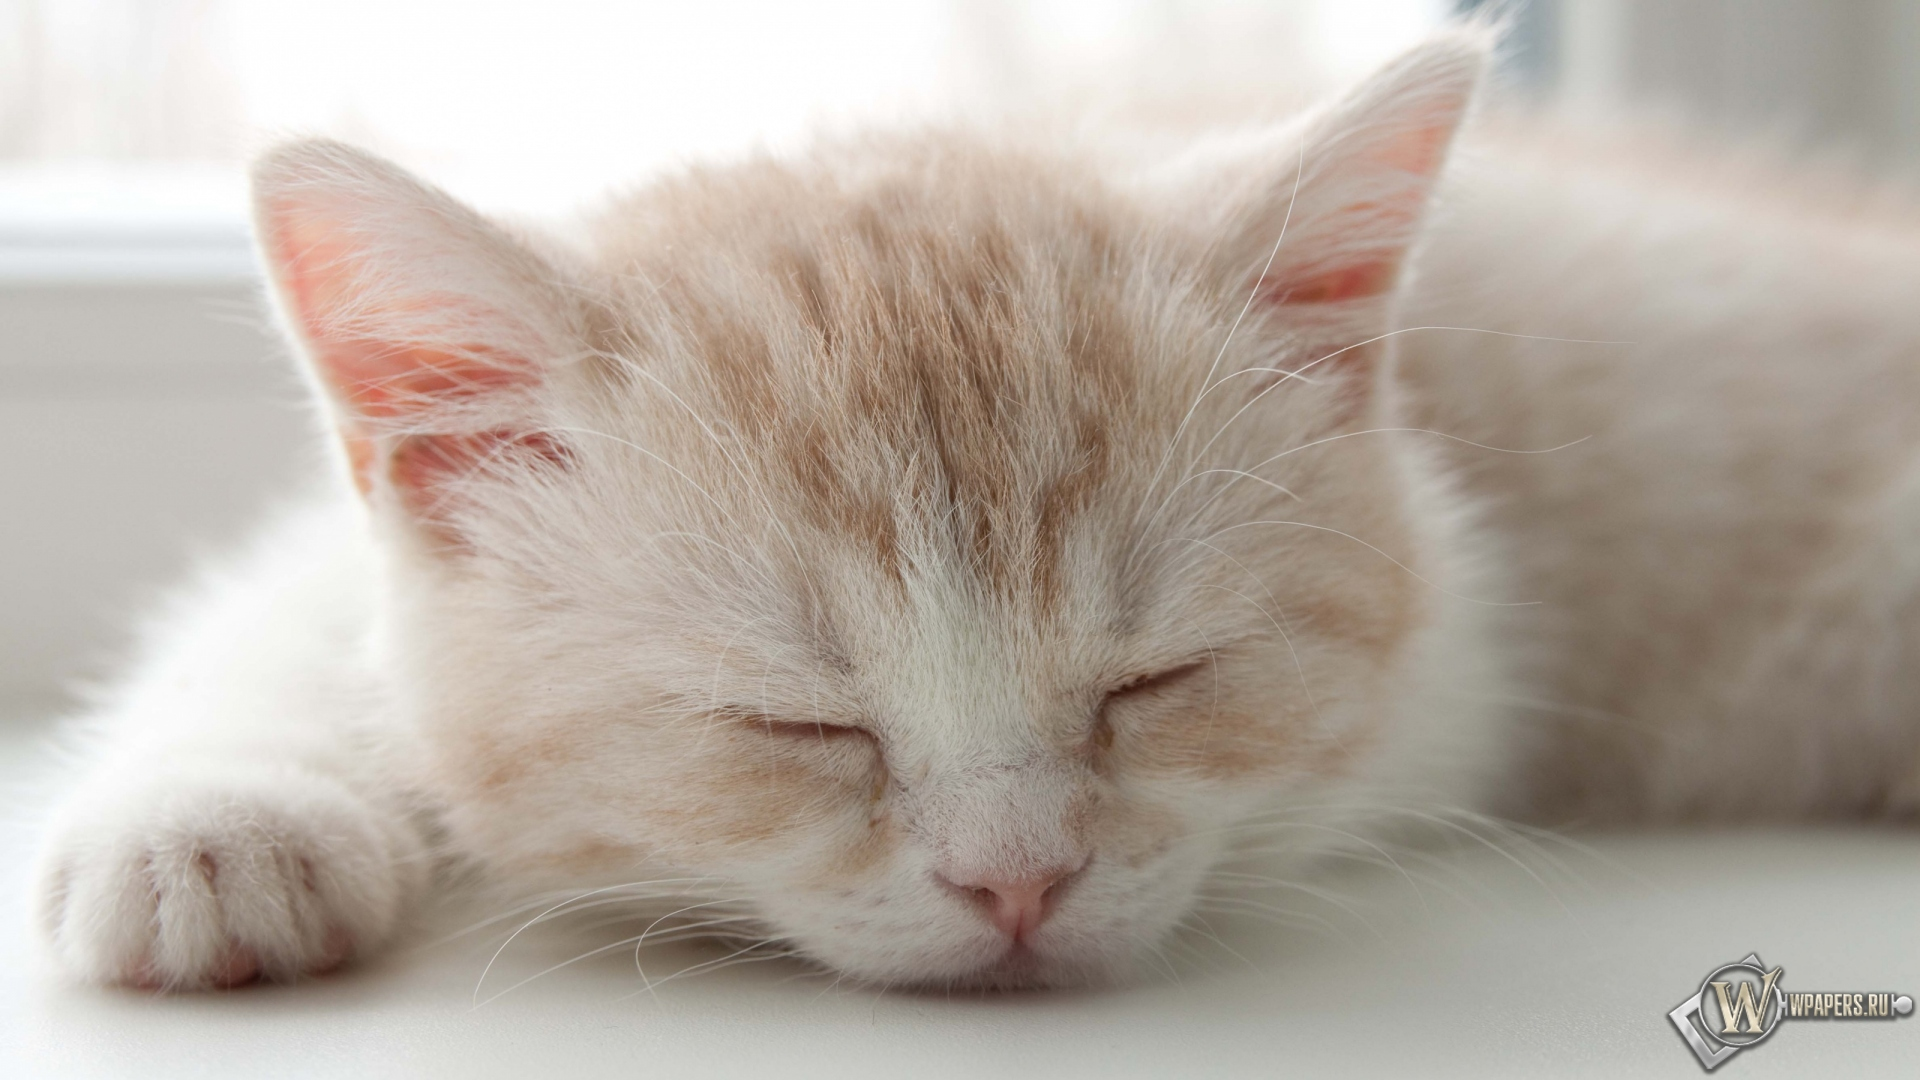 Котёнок спит 1920x1080